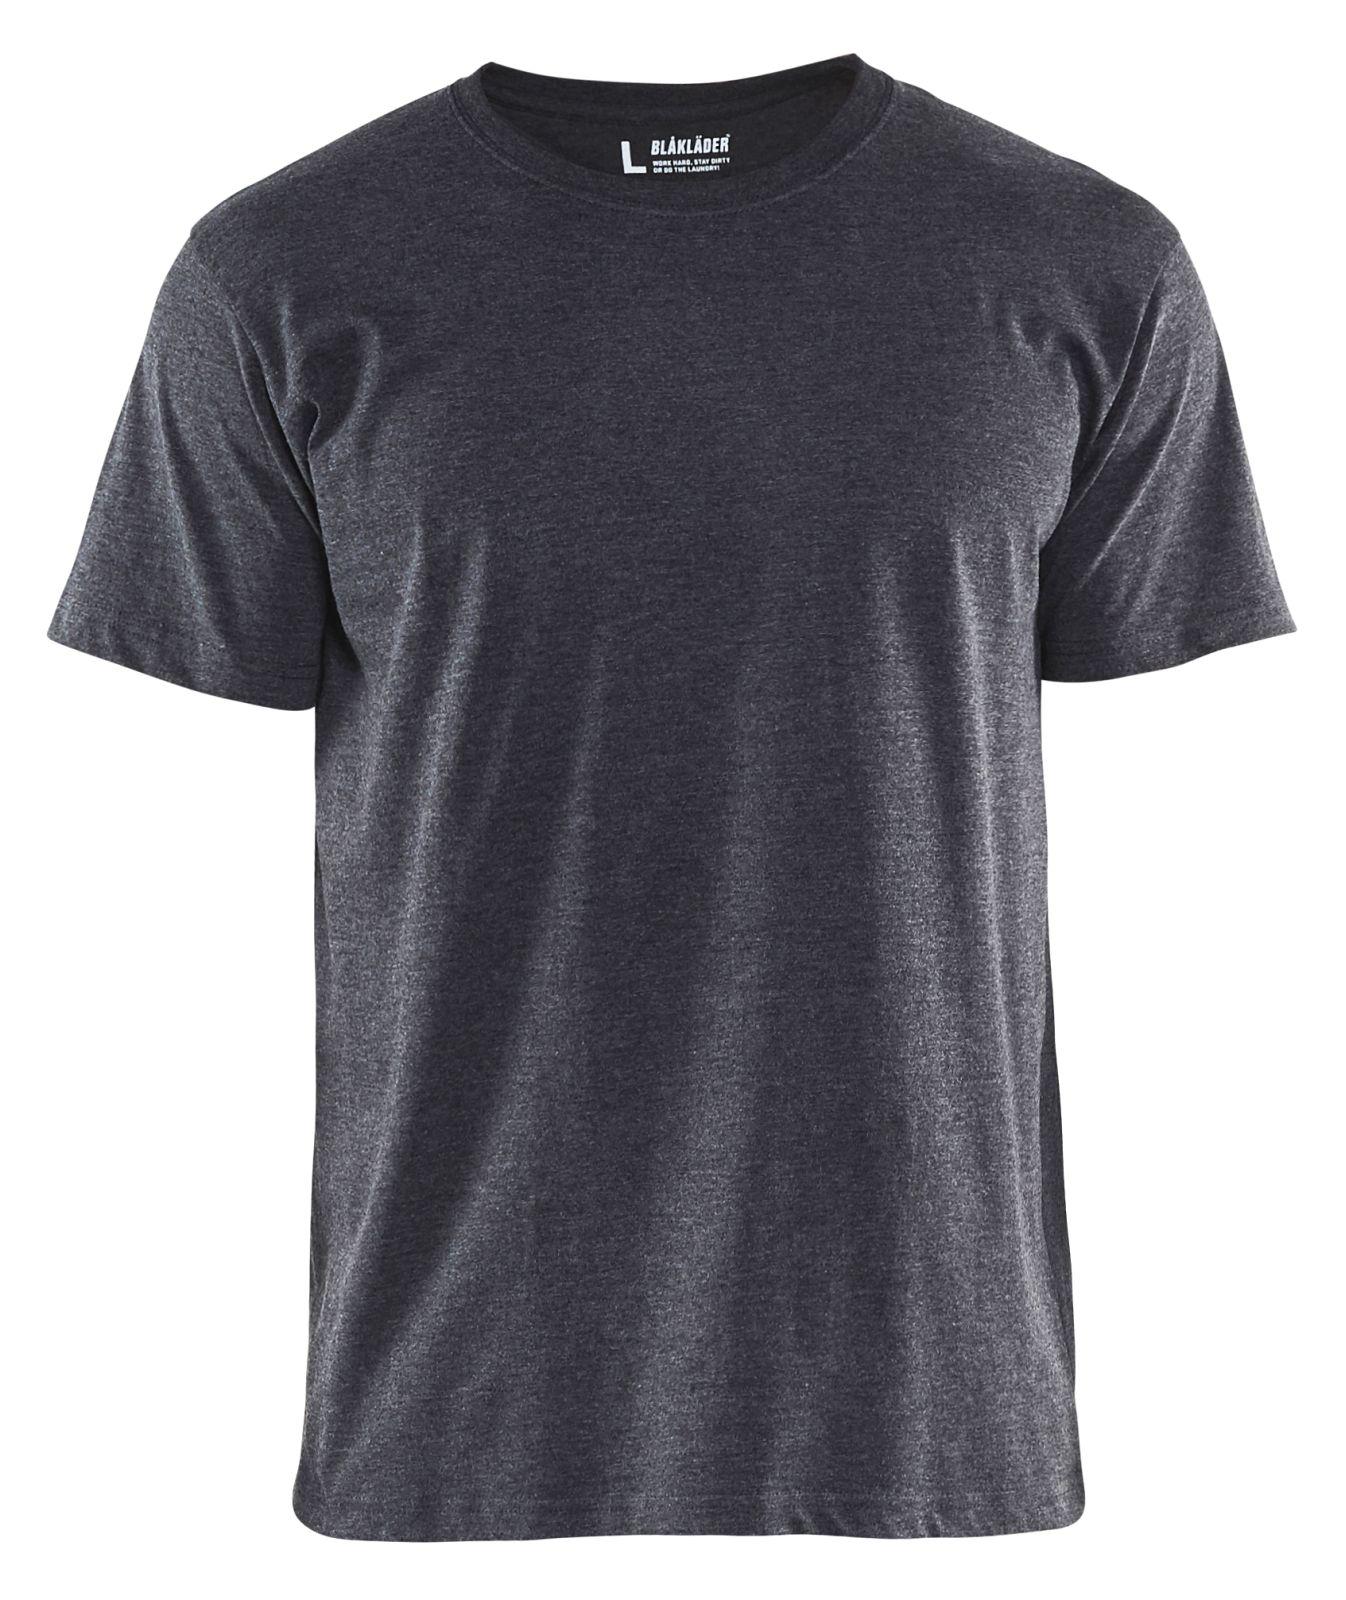 Blaklader T-shirts 33251053 5-pack zwart melee(9991)